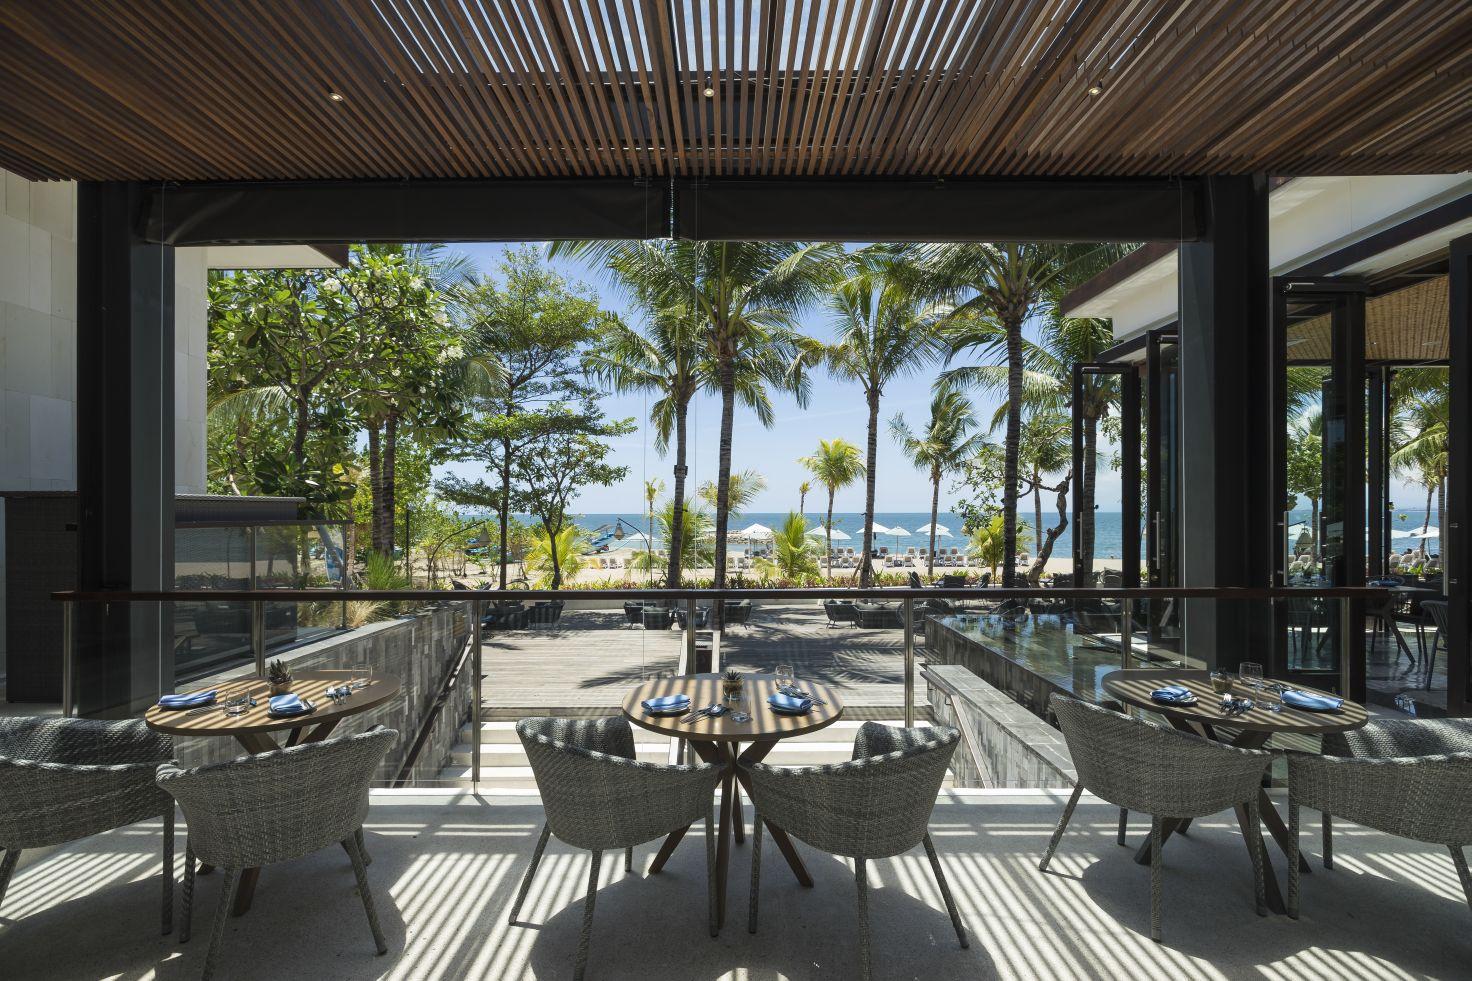 http://highend-traveller.com/retox-and-recharge-at-the-anvaya-beach-resort-bali/